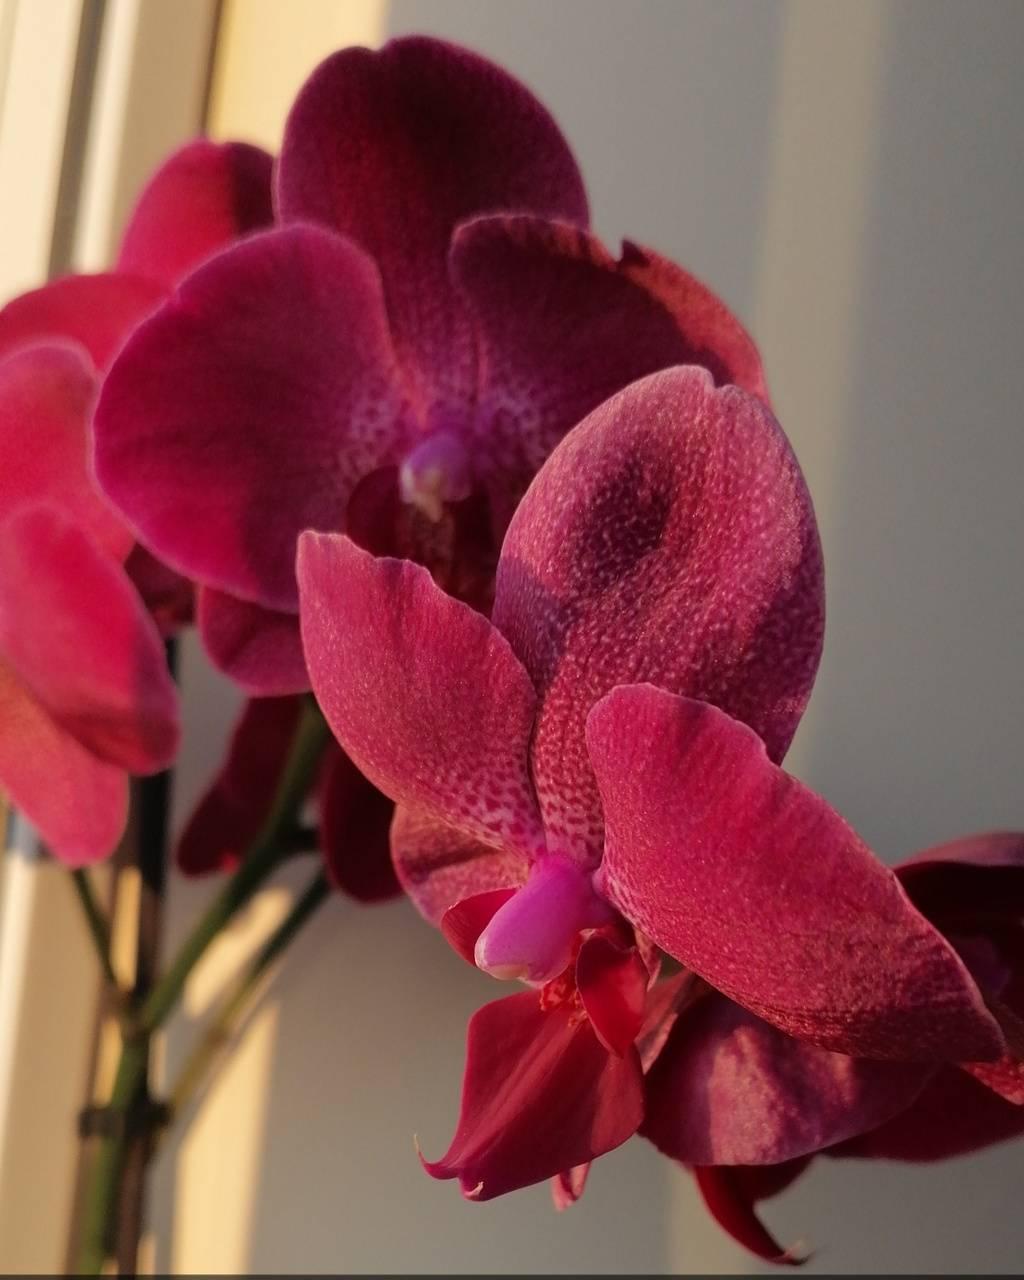 Golden hour orchid